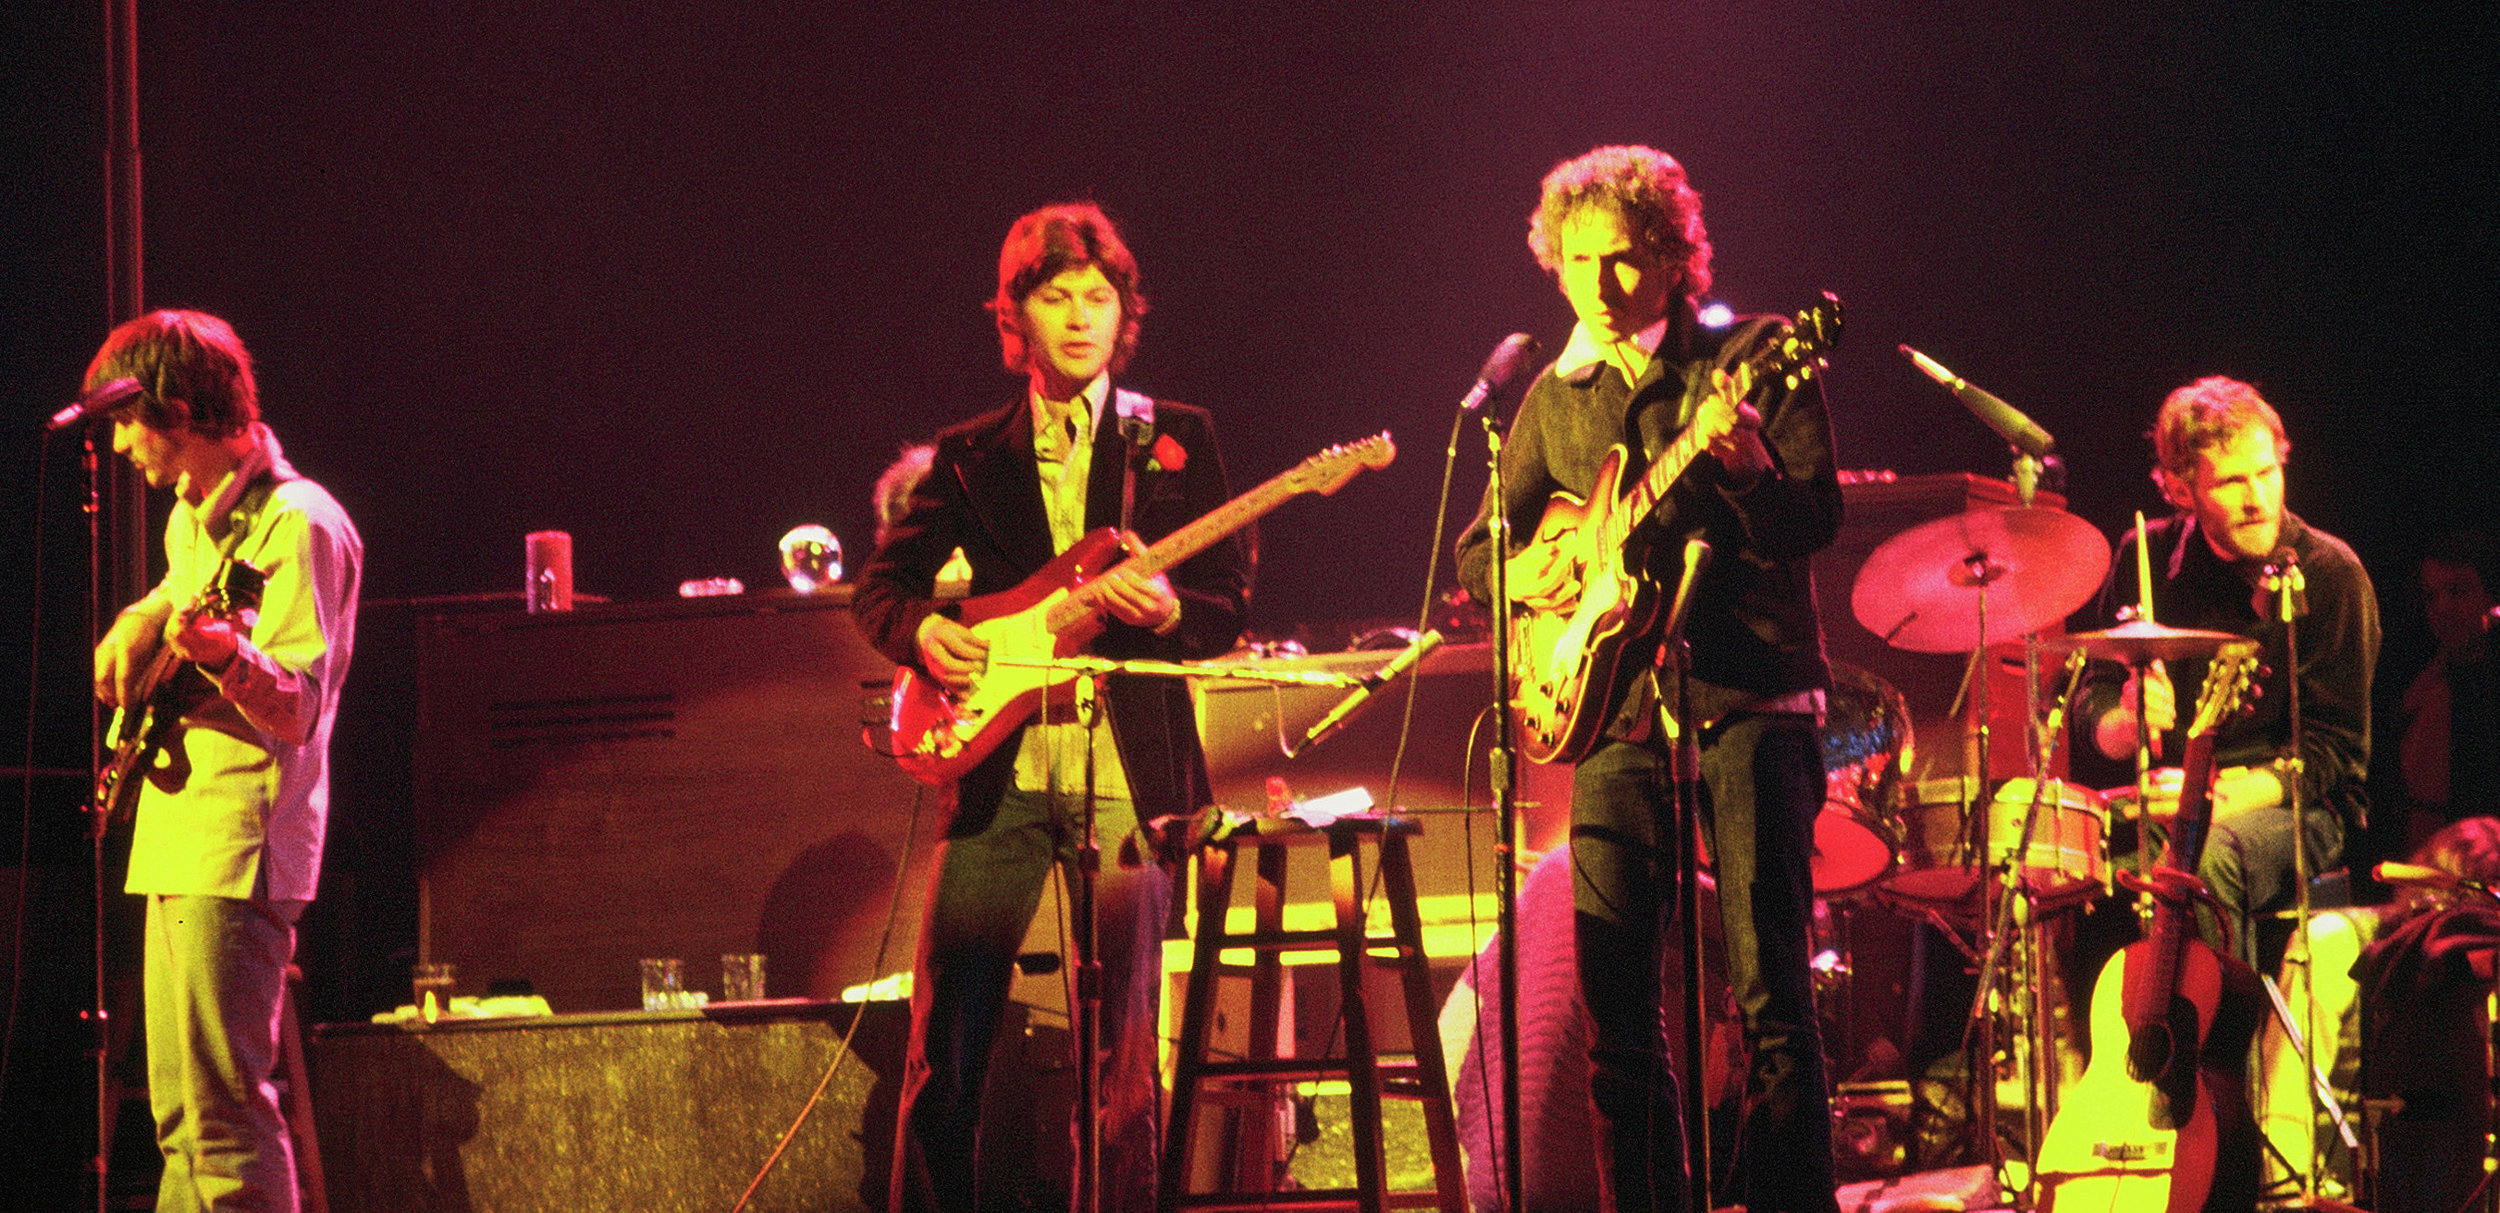 Bob_Dylan_and_The_Band_-_1974.jpg